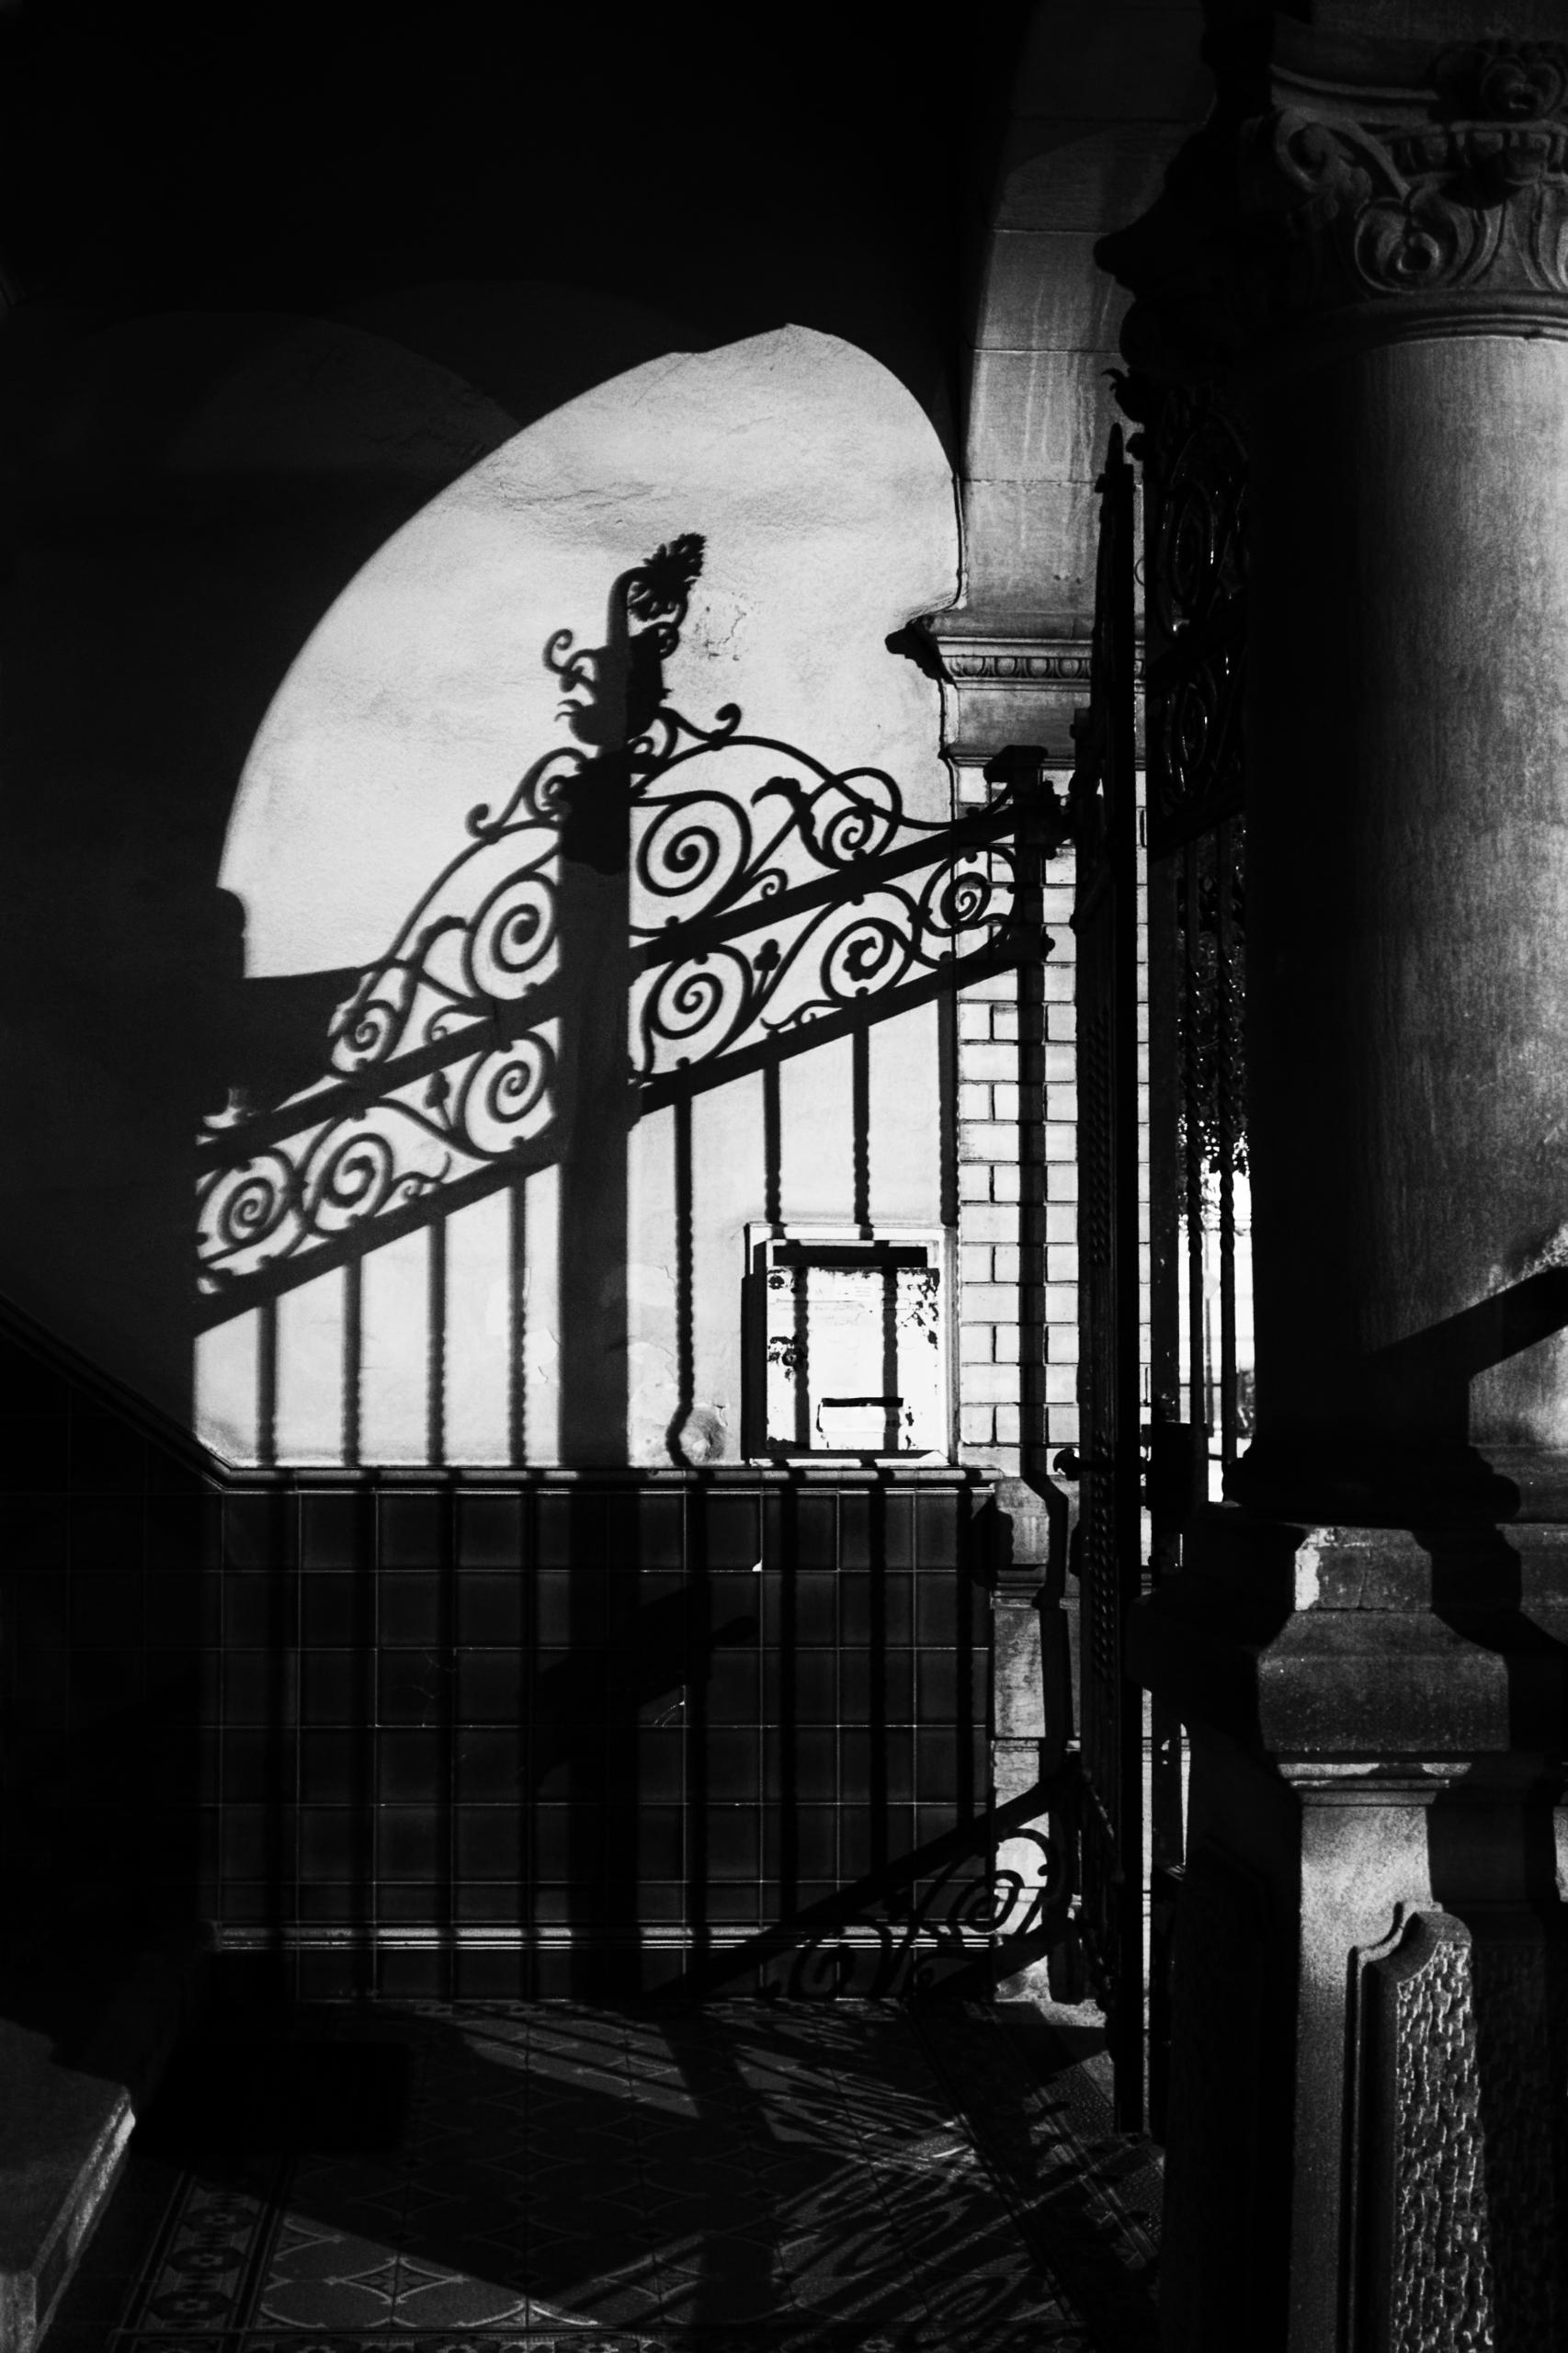 photography, nighttime, monochrome - marcushammerschmitt | ello